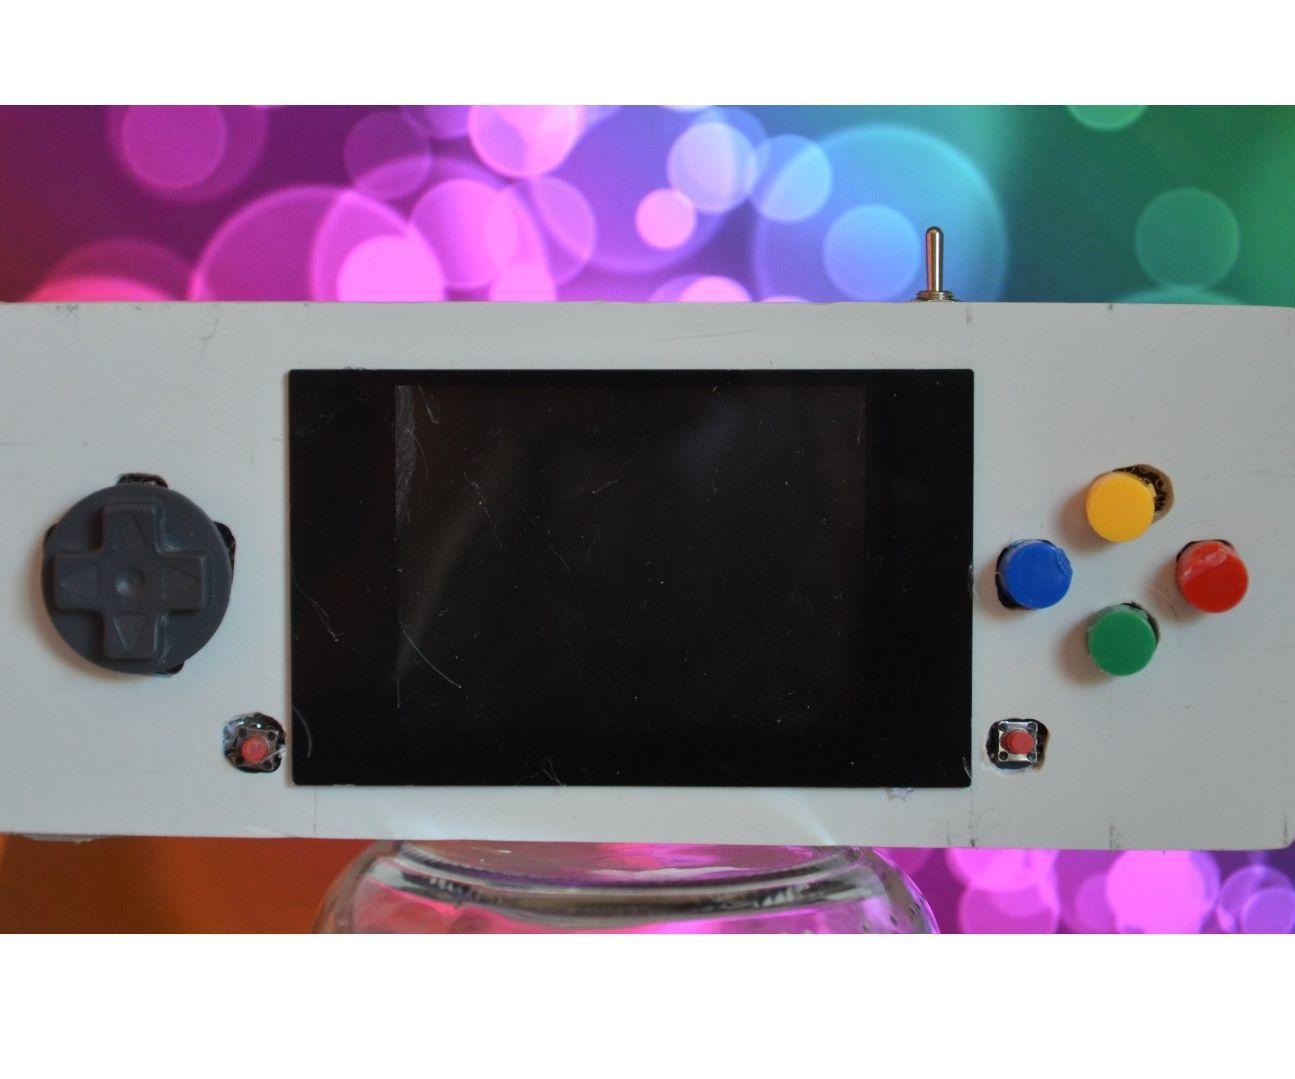 PiSP Pi Station Portable, A Raspberry Pi Gaming Handheld